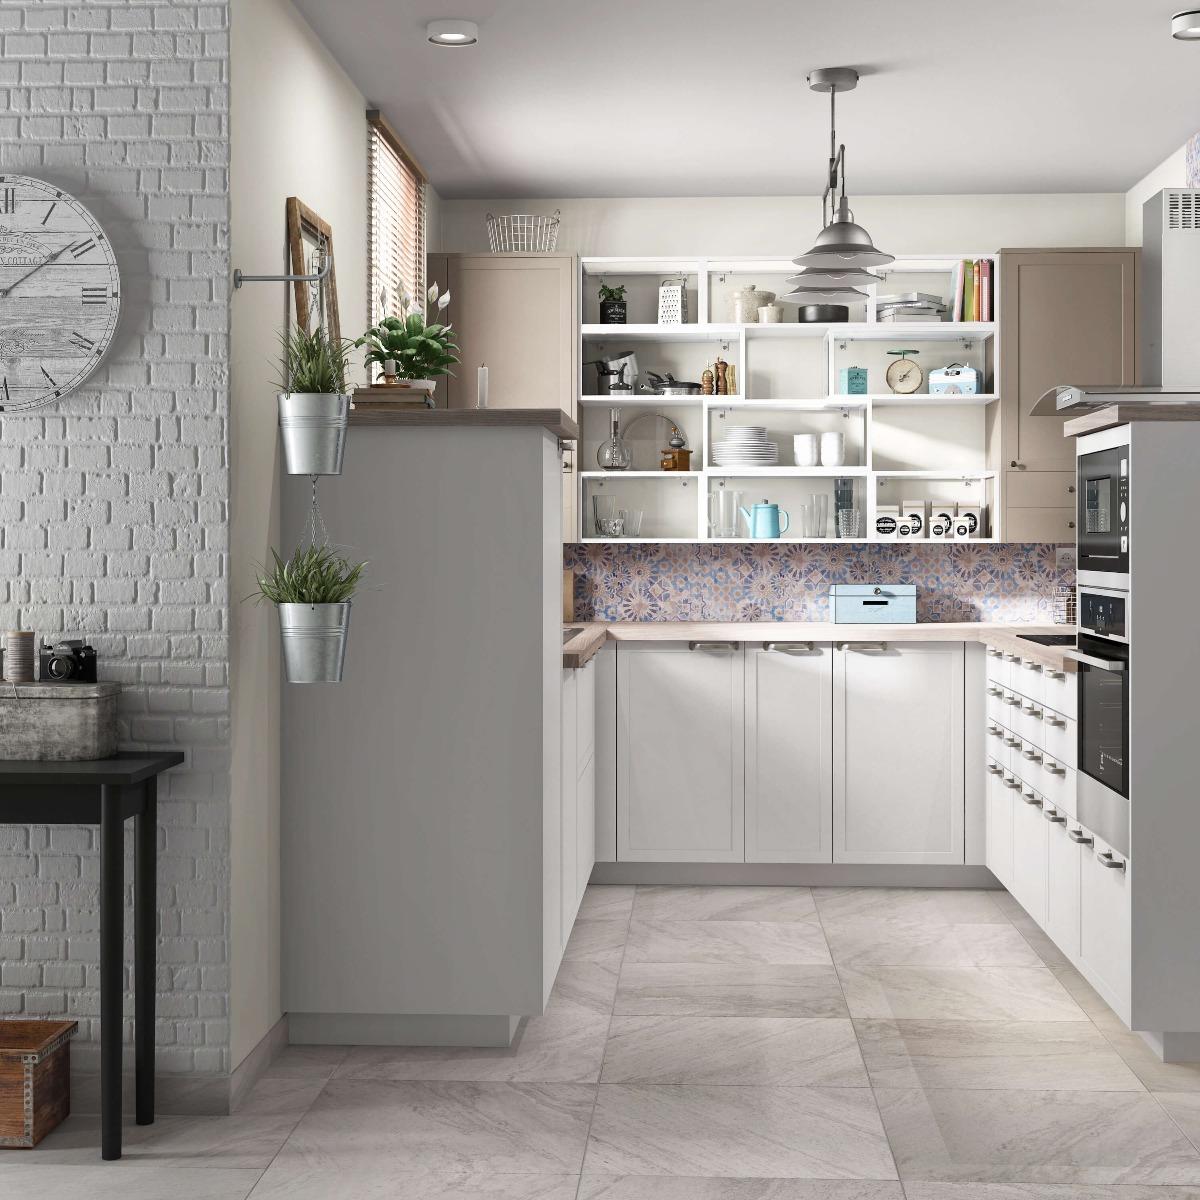 Delinia Newport White Designer Kitchen Mobi - Example 2